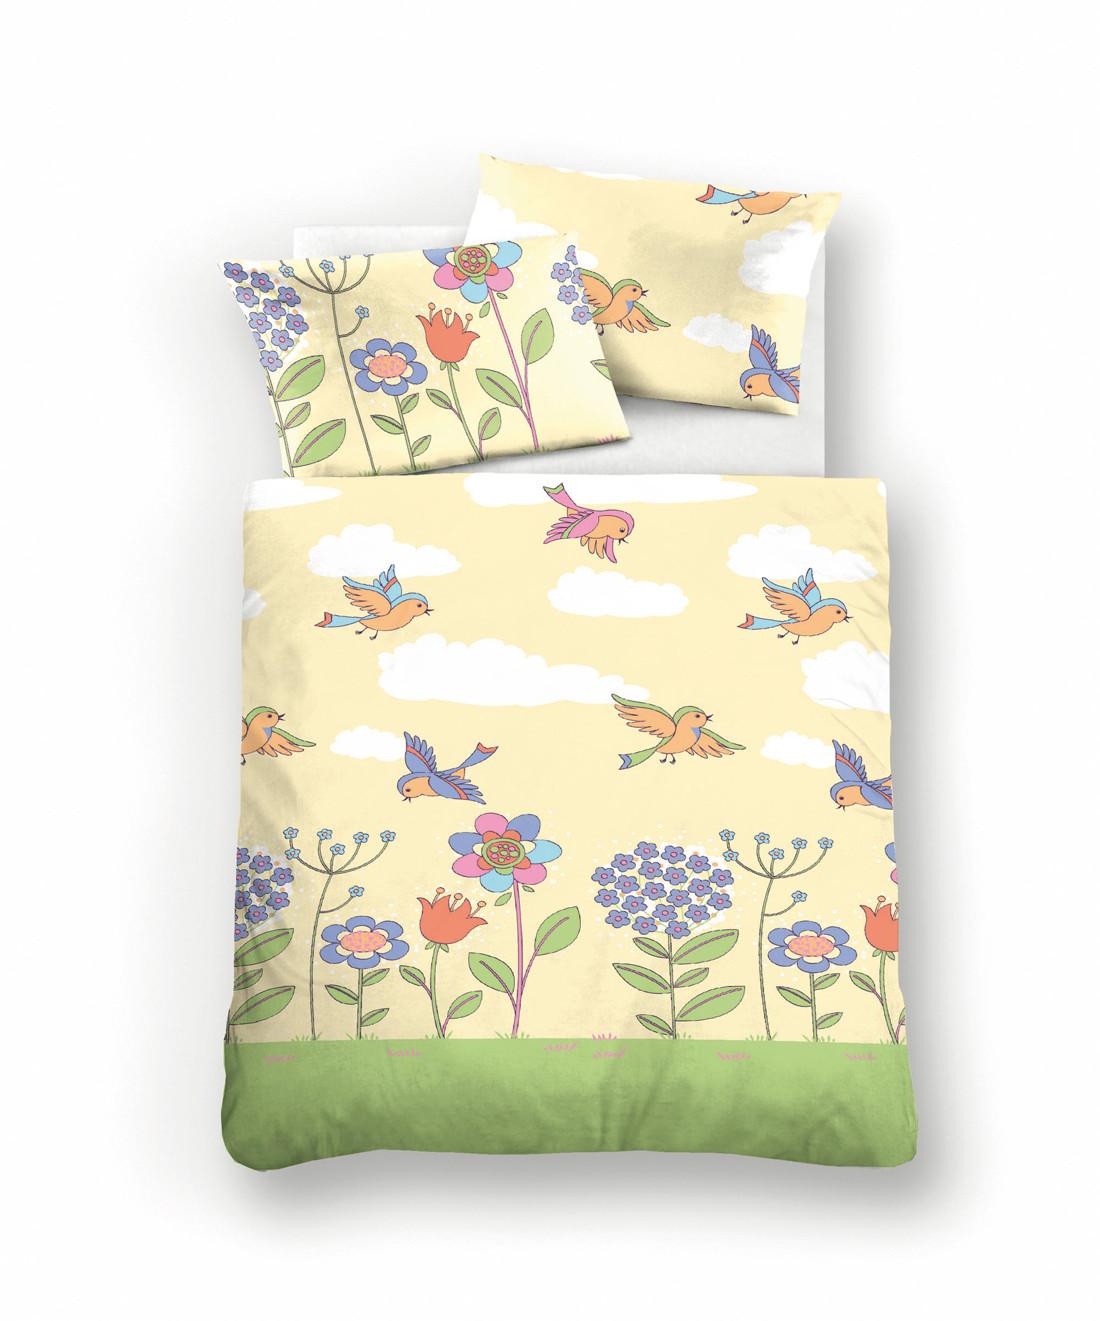 biberna baby linon bettw sche tierpiraten 100x135 40x60 in blau schlafst. Black Bedroom Furniture Sets. Home Design Ideas